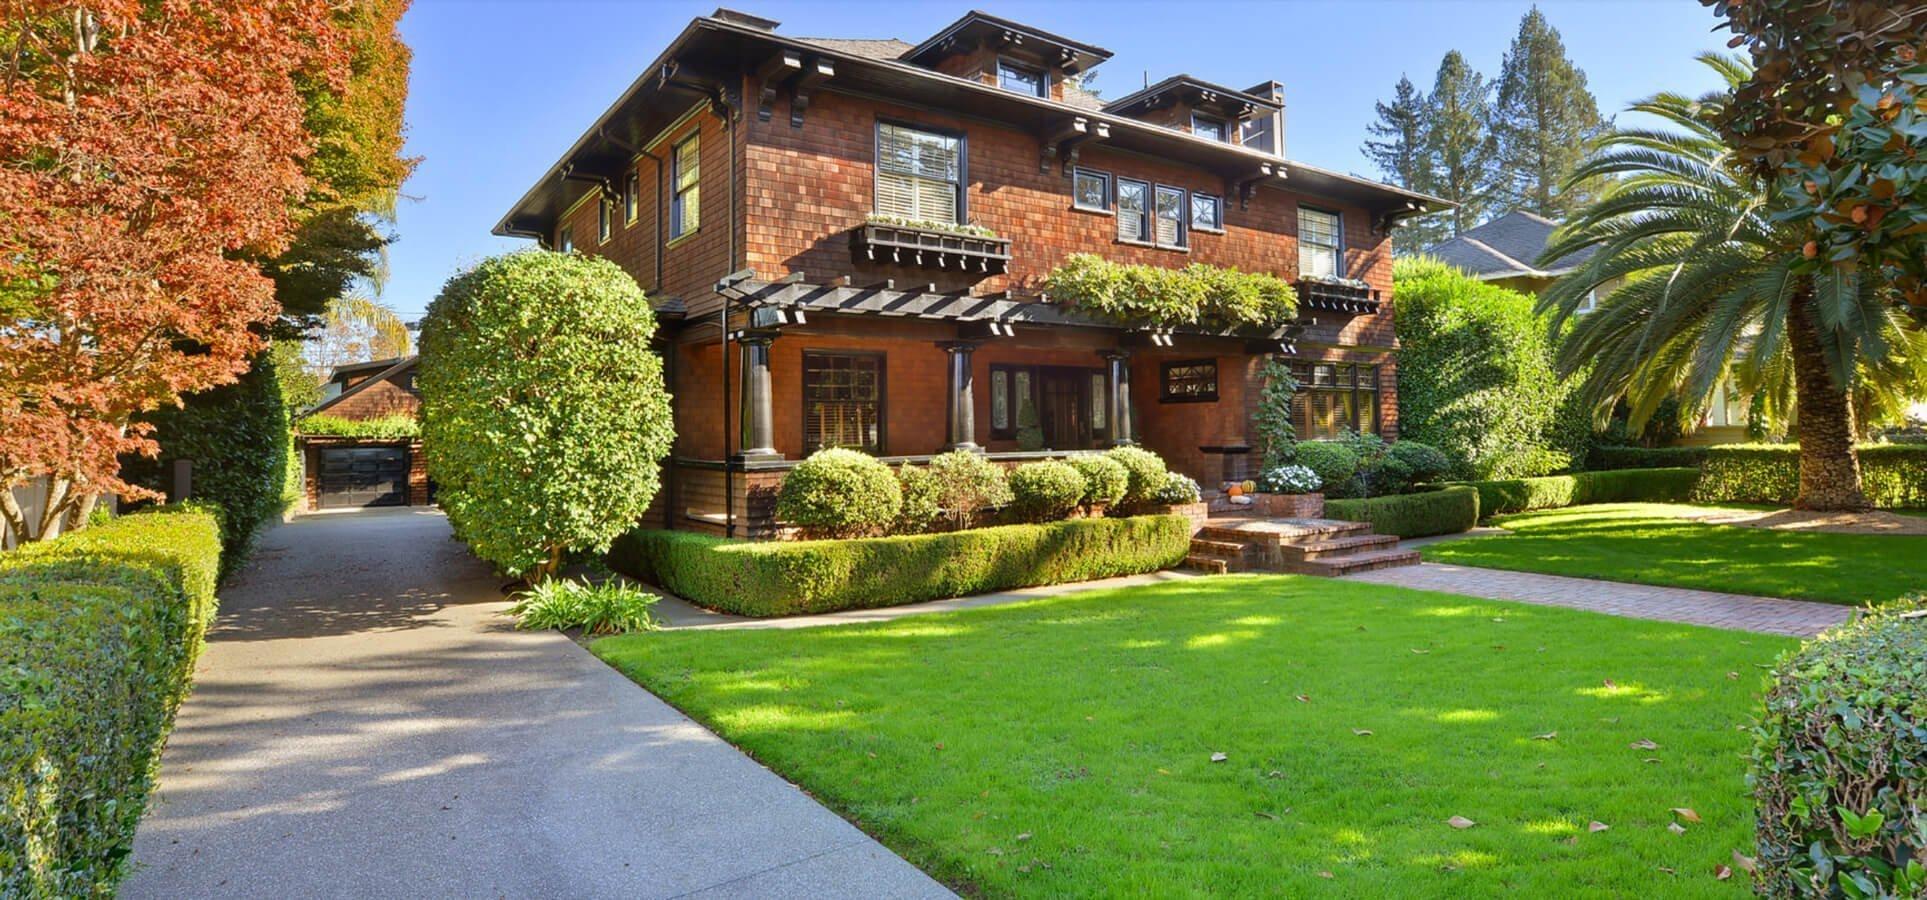 Renovated Historic Home in Santa Rosa Exterior Front